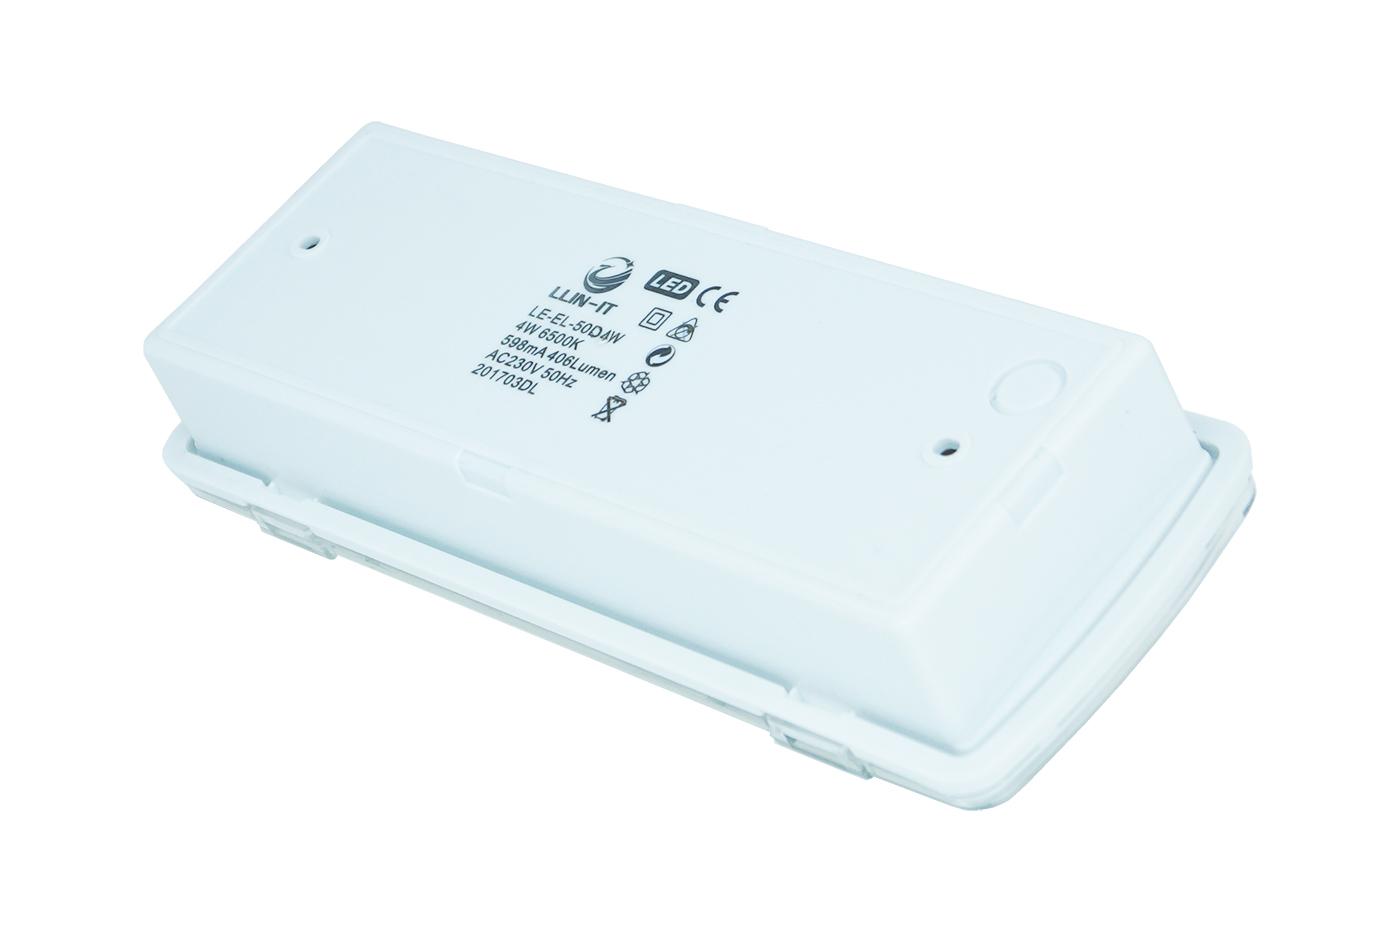 Plafoniere Con Luce Emergenza : Bes 21391 lampade emergenza beselettronica lampada plafoniera